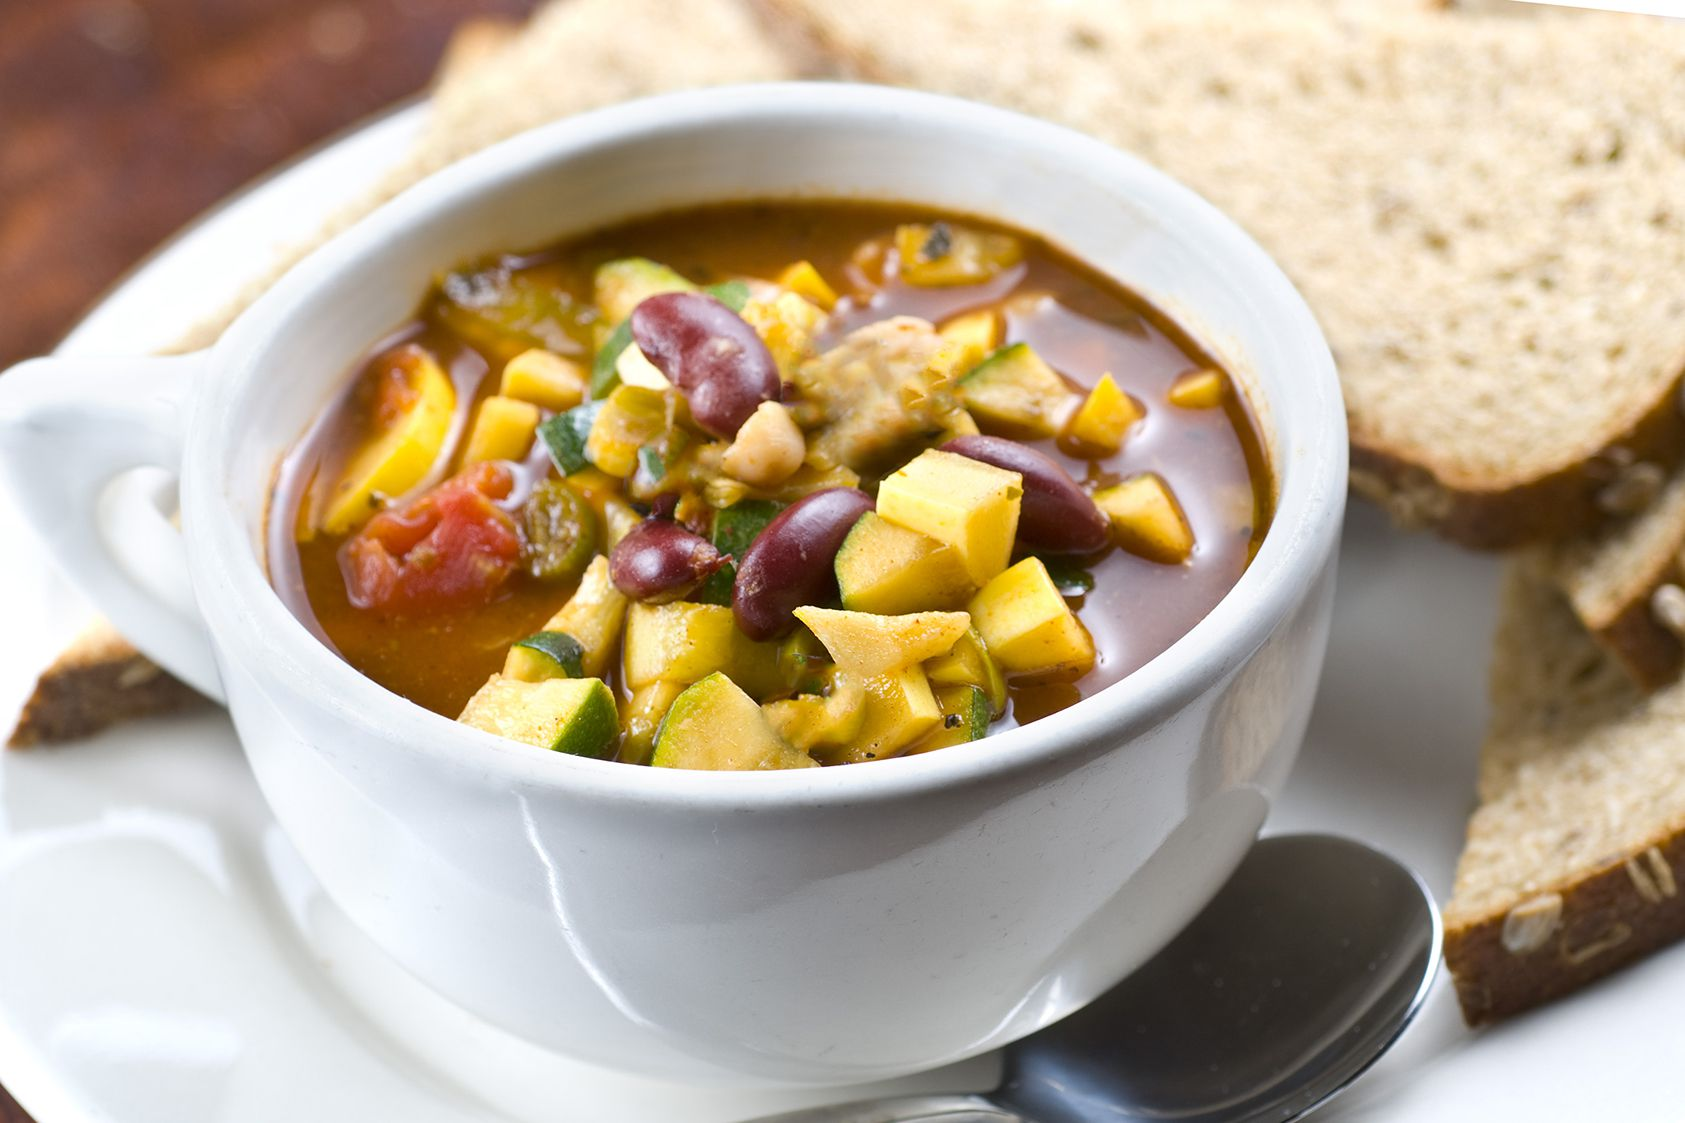 Vegetarian Vegetable Chili Recipe With Zucchini